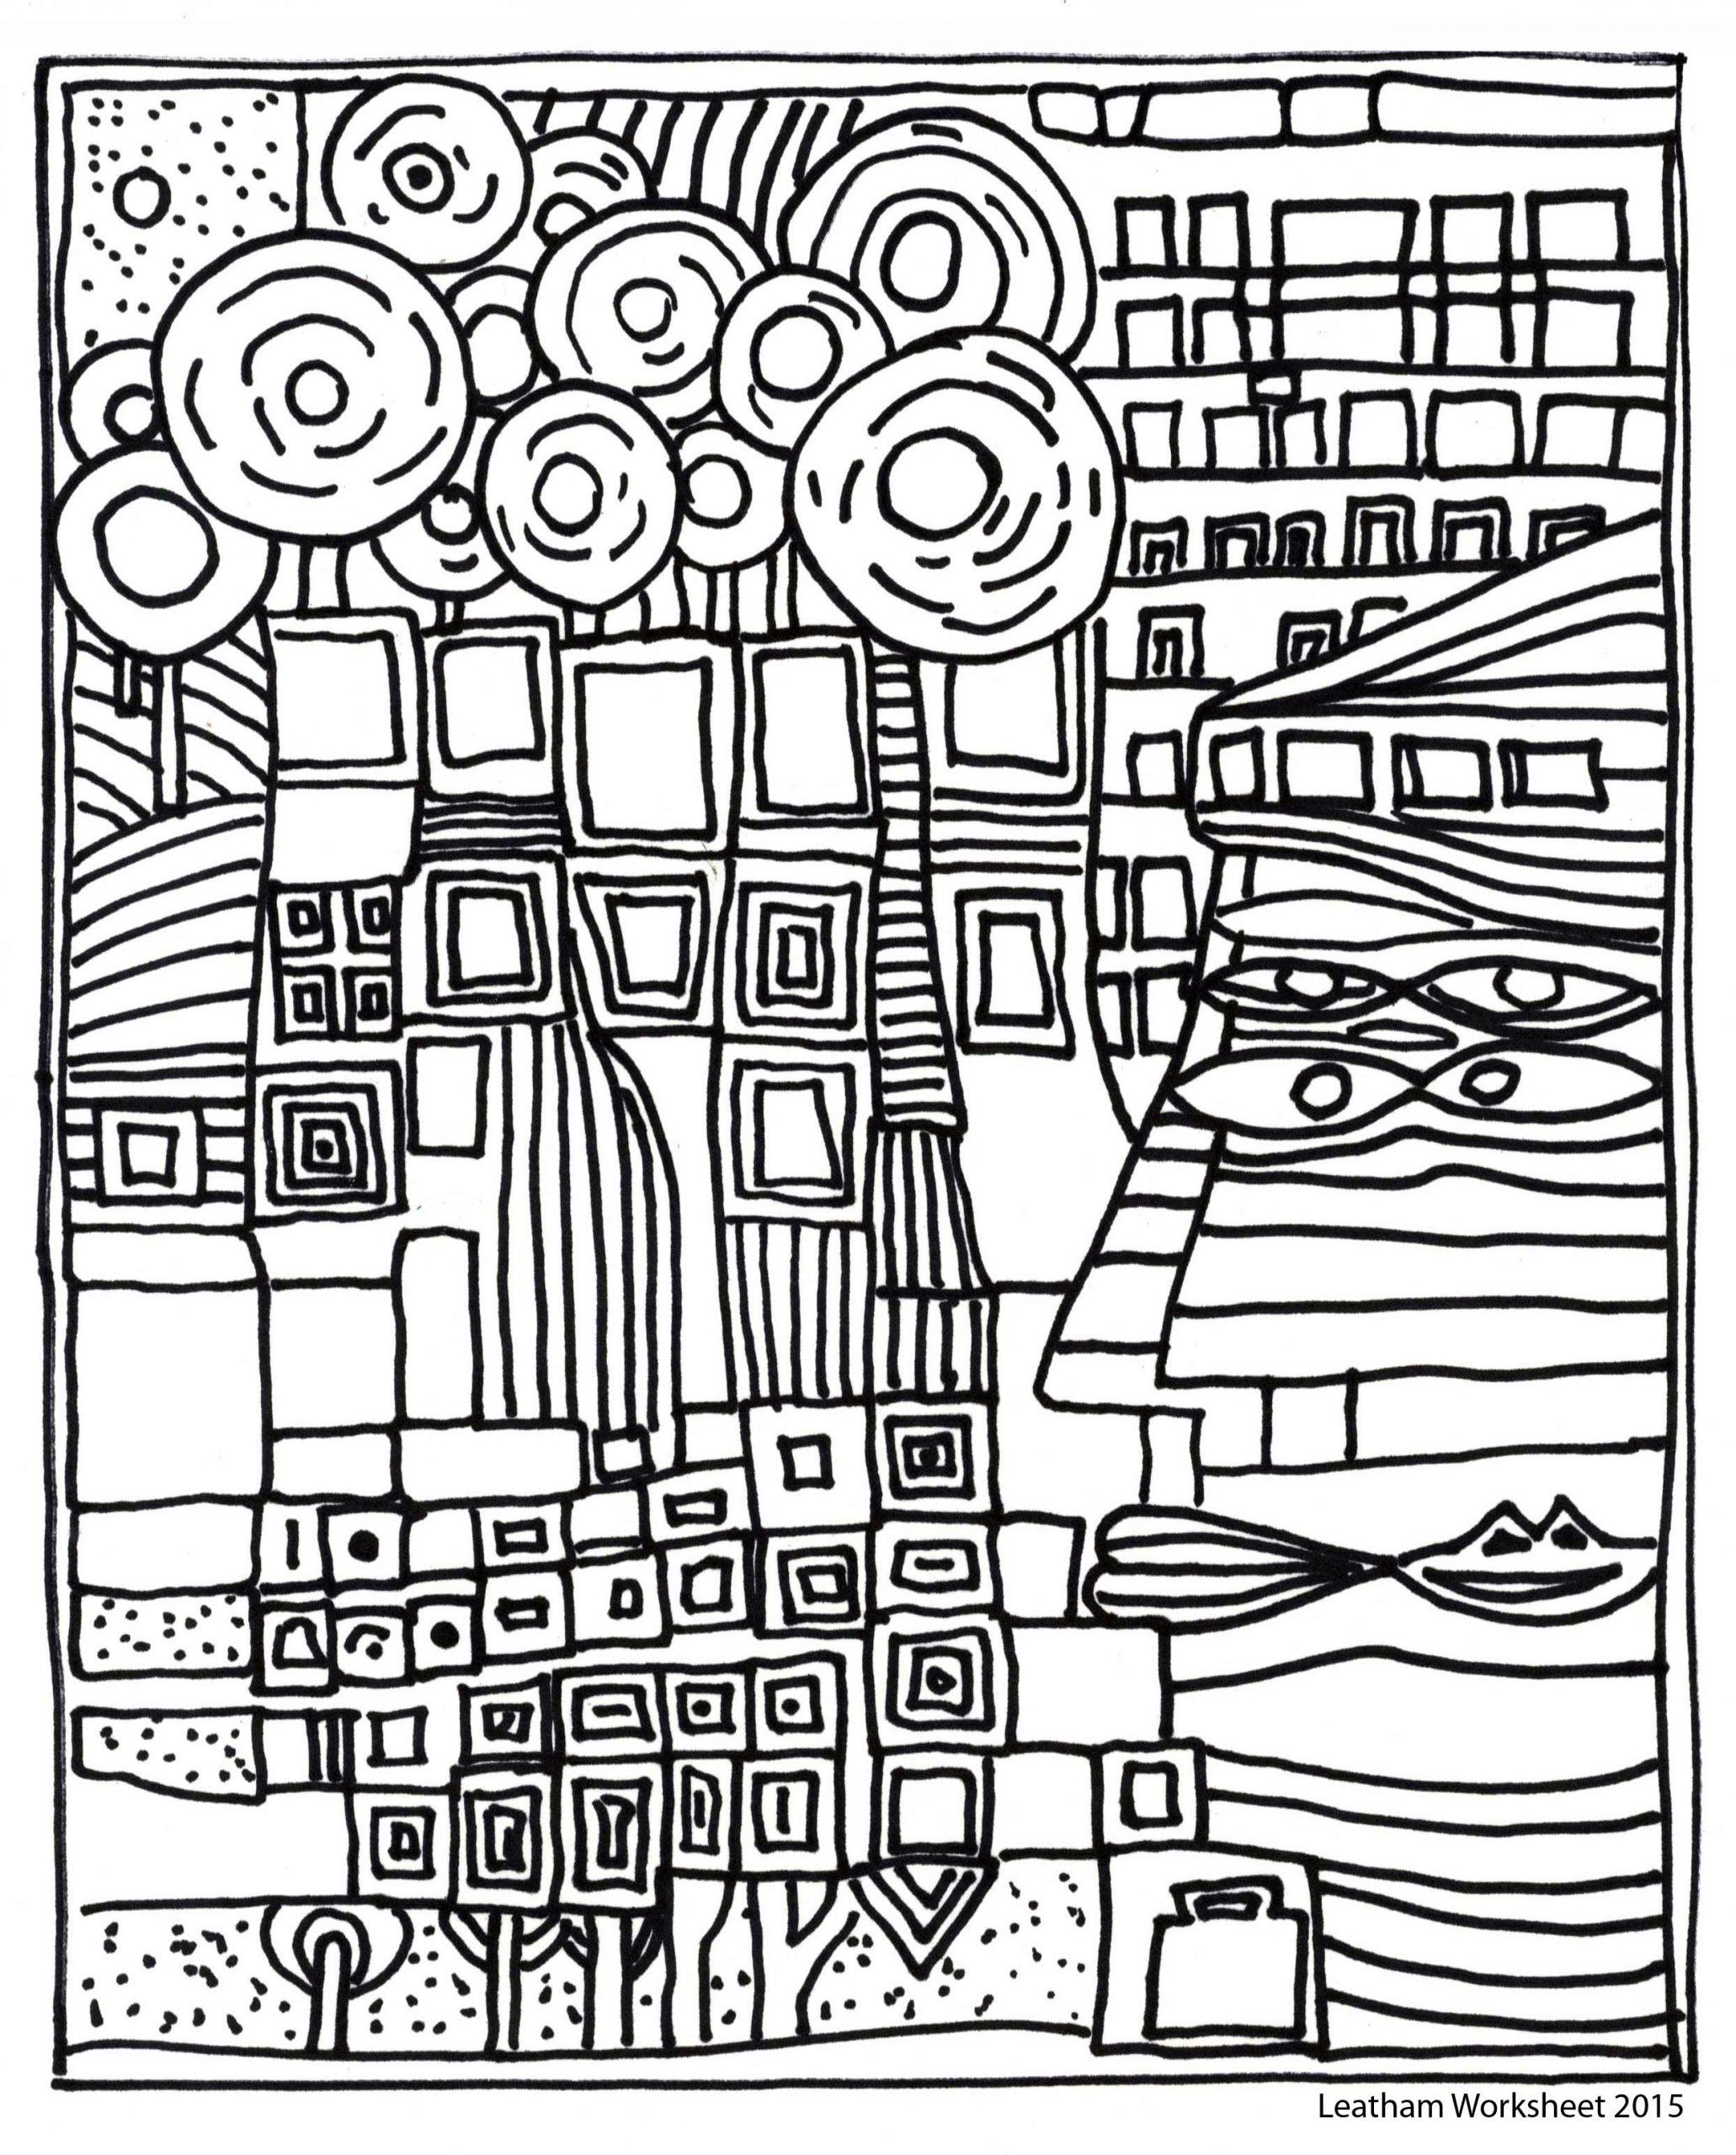 Hundertwasser Style Line Art. Feel Free To Use It über Hundertwasser Zum Ausmalen